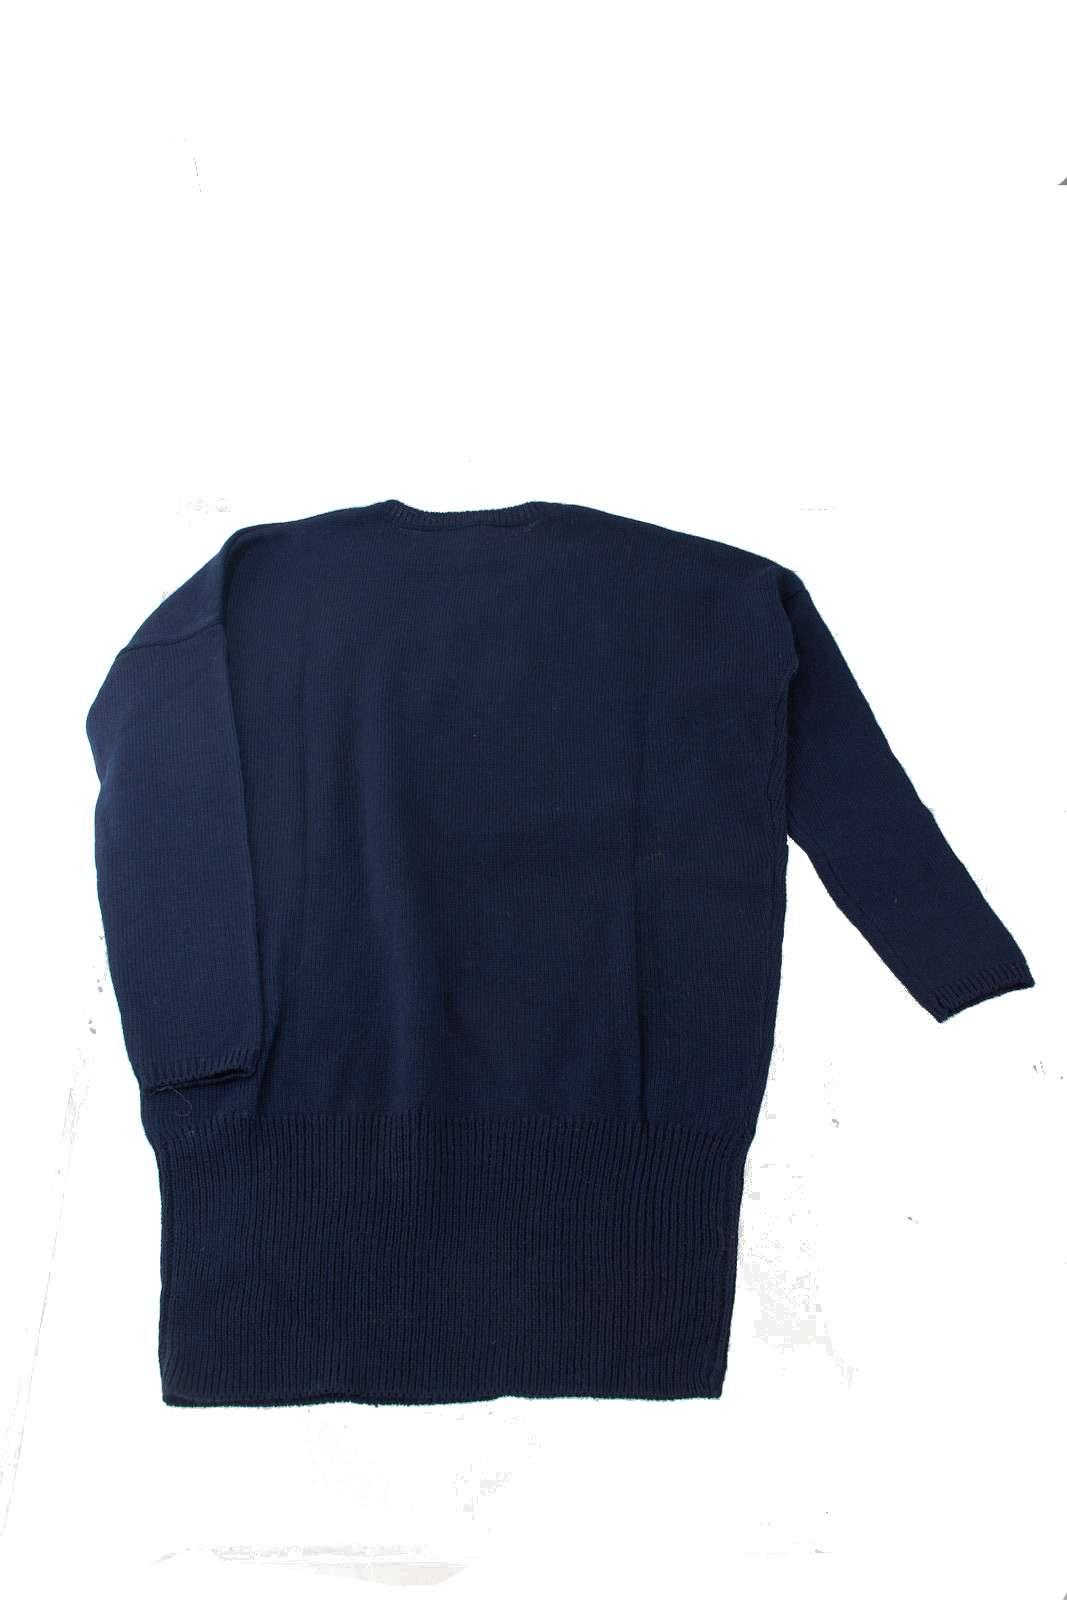 https://www.parmax.com/media/catalog/product/a/i/AI-outlet_parmax-maglia-bambina-Liu%20Jo-g68054ma28h-B_1.jpg